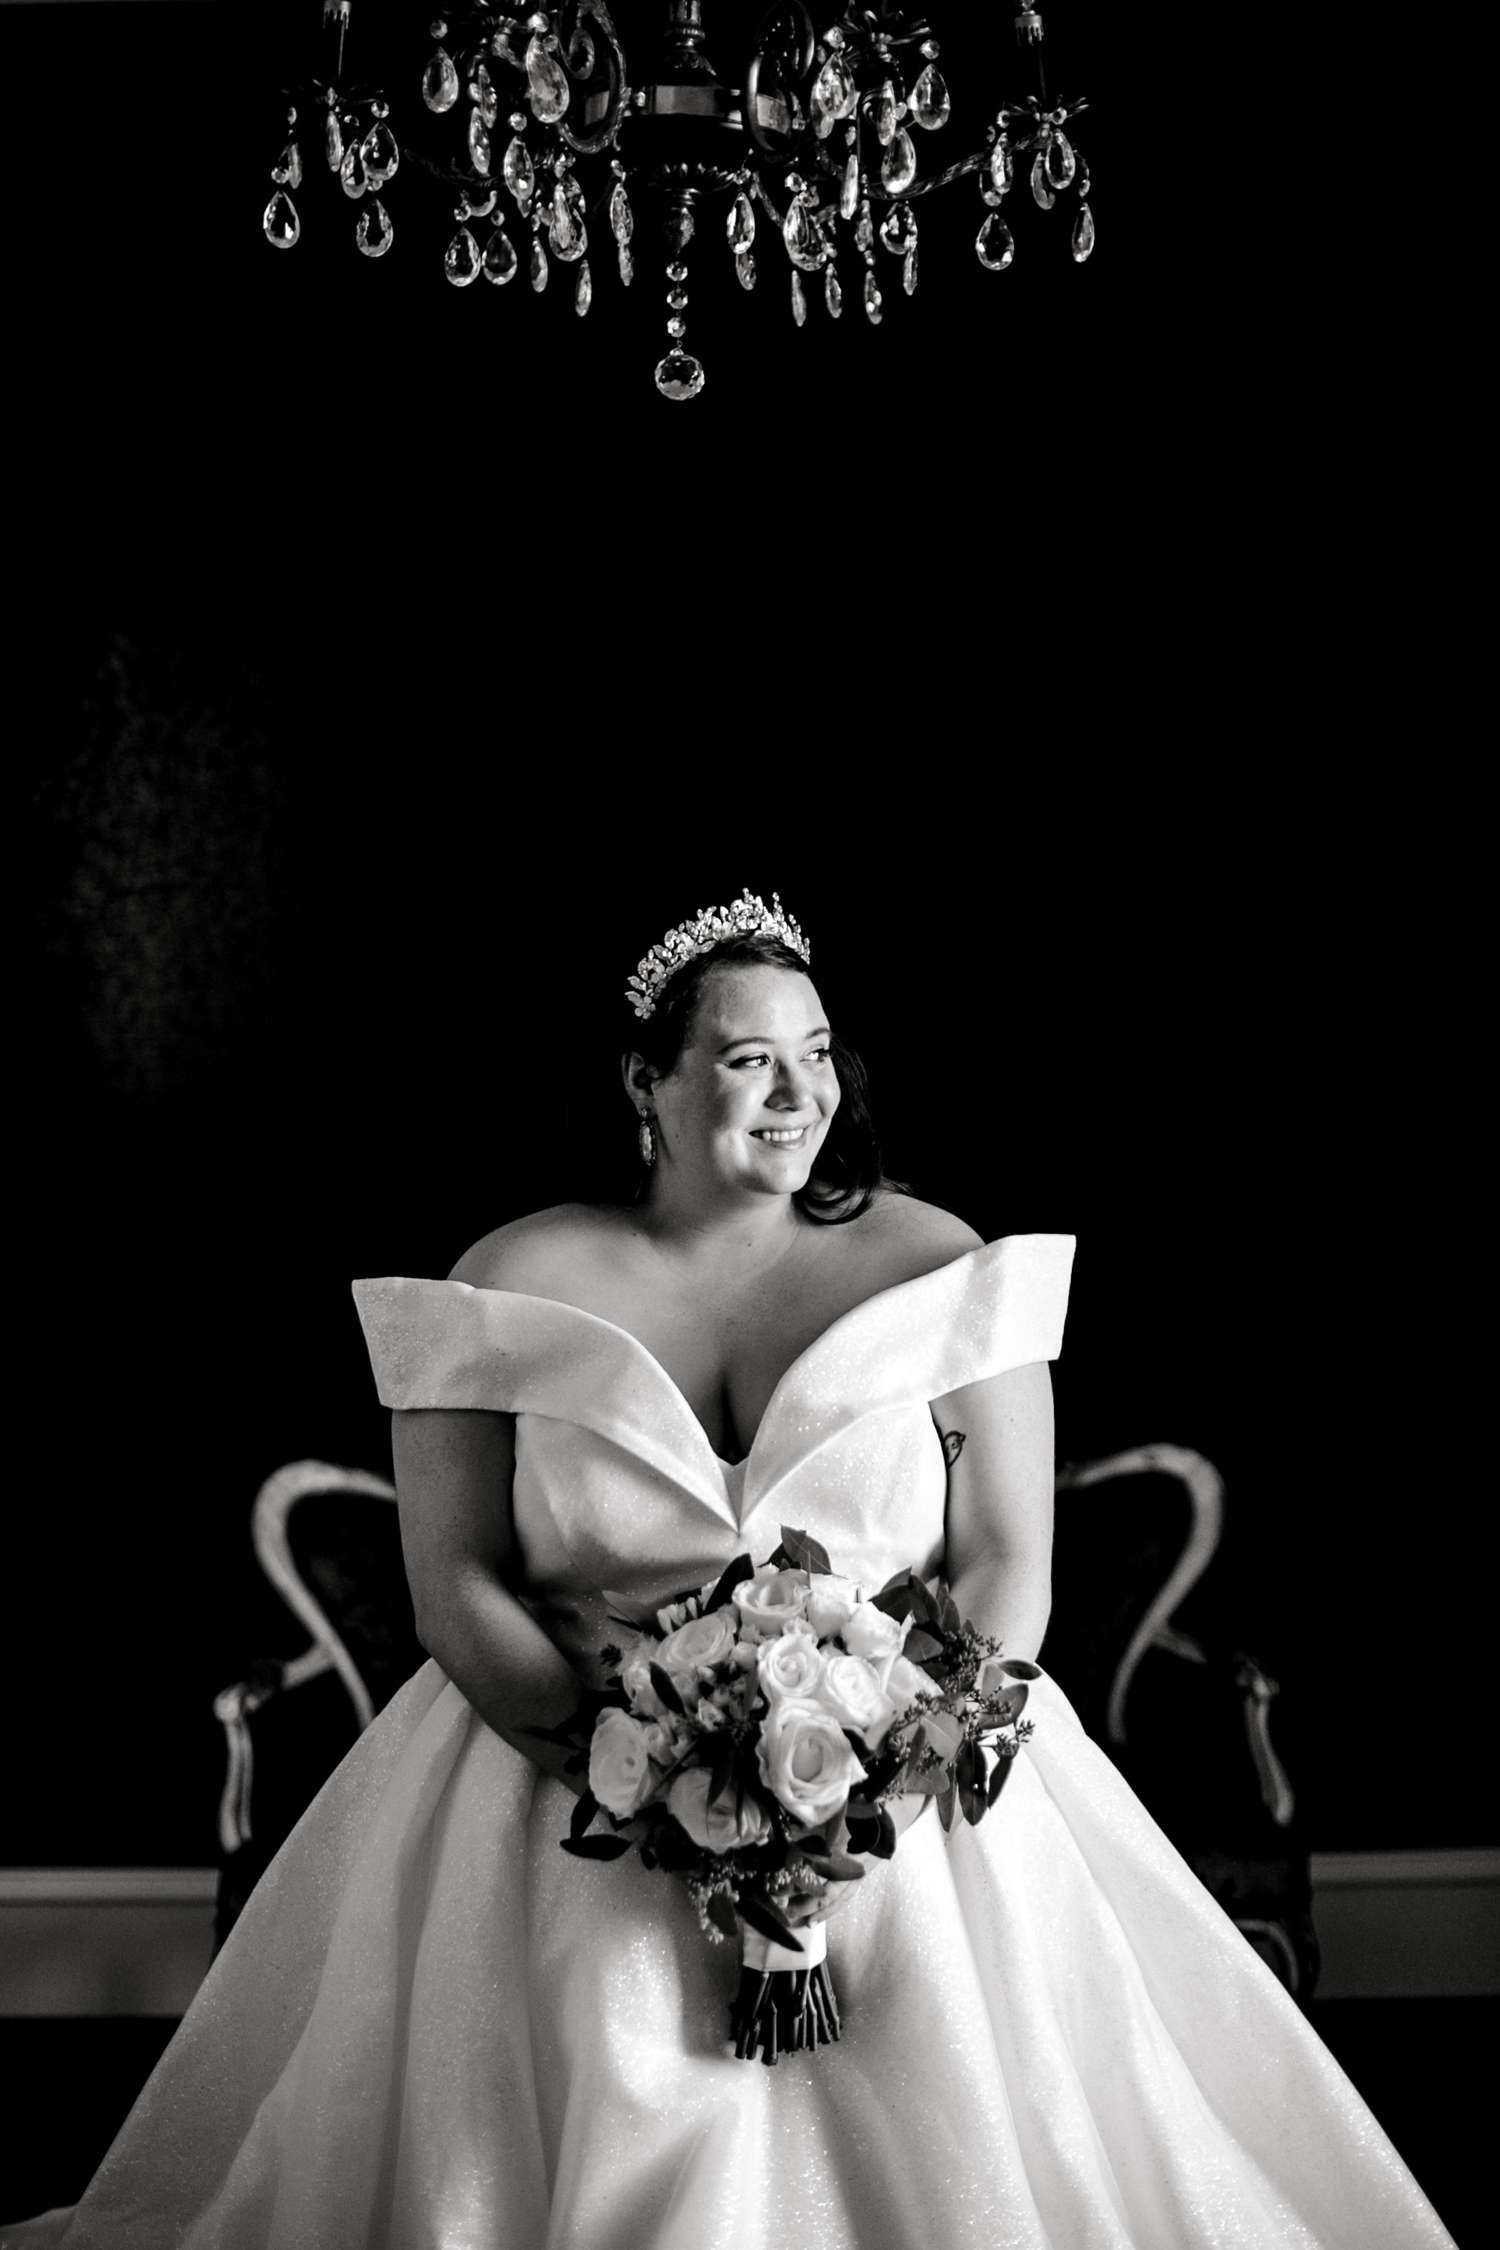 CASSIDY+AND+HARLEY+BRADLEY+EBERLEY+BROOKS+CHAPEL+LUBBOCK+WEDDING+PHOTOGRAPHER+ALLEEJ_0030.jpg